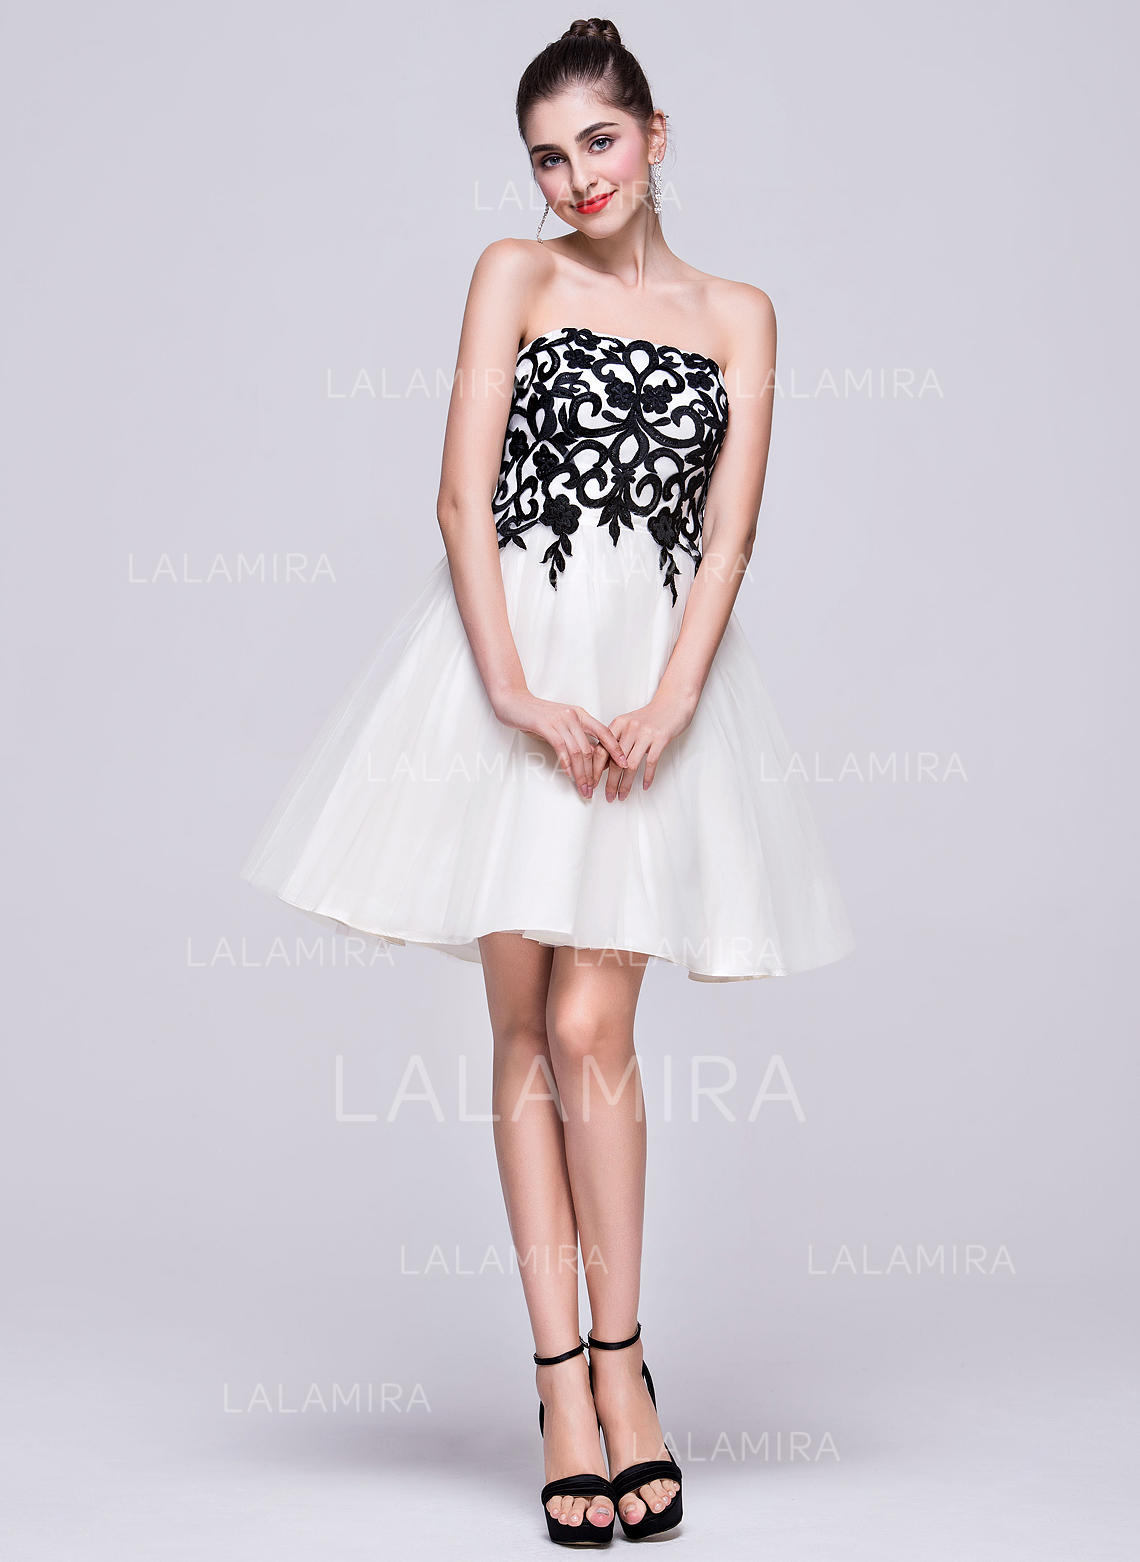 bdf65ae8671 A-Line Princess Short Mini Homecoming Dresses Strapless Tulle Sleeveless  (022214057). Loading zoom